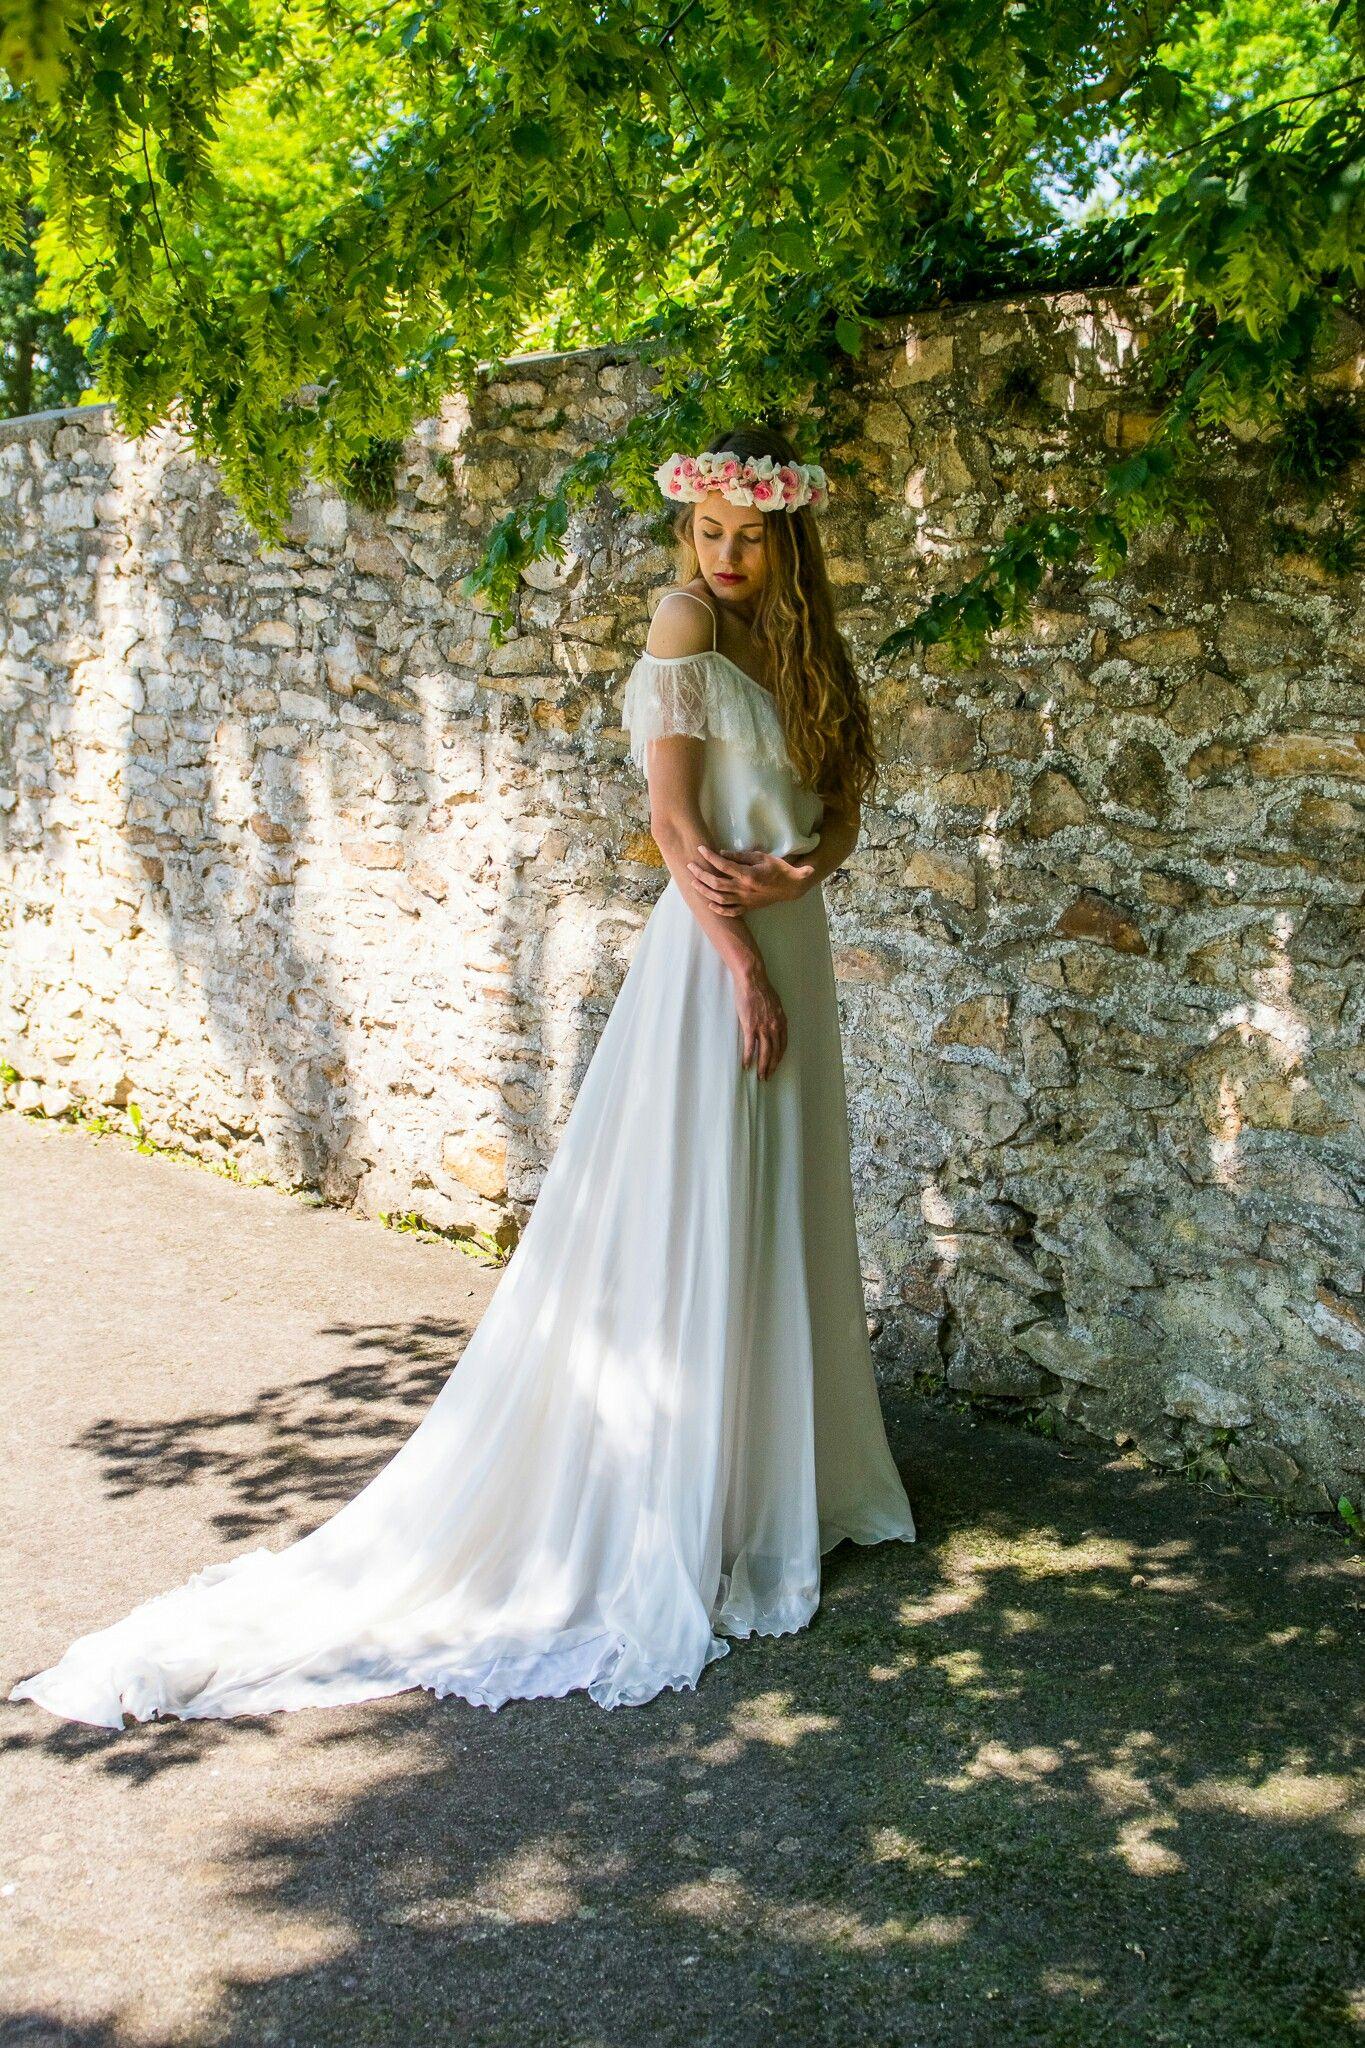 Nouméa collection 2017 #adelinebauwin #adelinebauwin17 #weddingdress #wedding #lace #dentelle #bride #bridetobe #robedemariee #madeinfrance #mariage #mariee #blondieconfettis